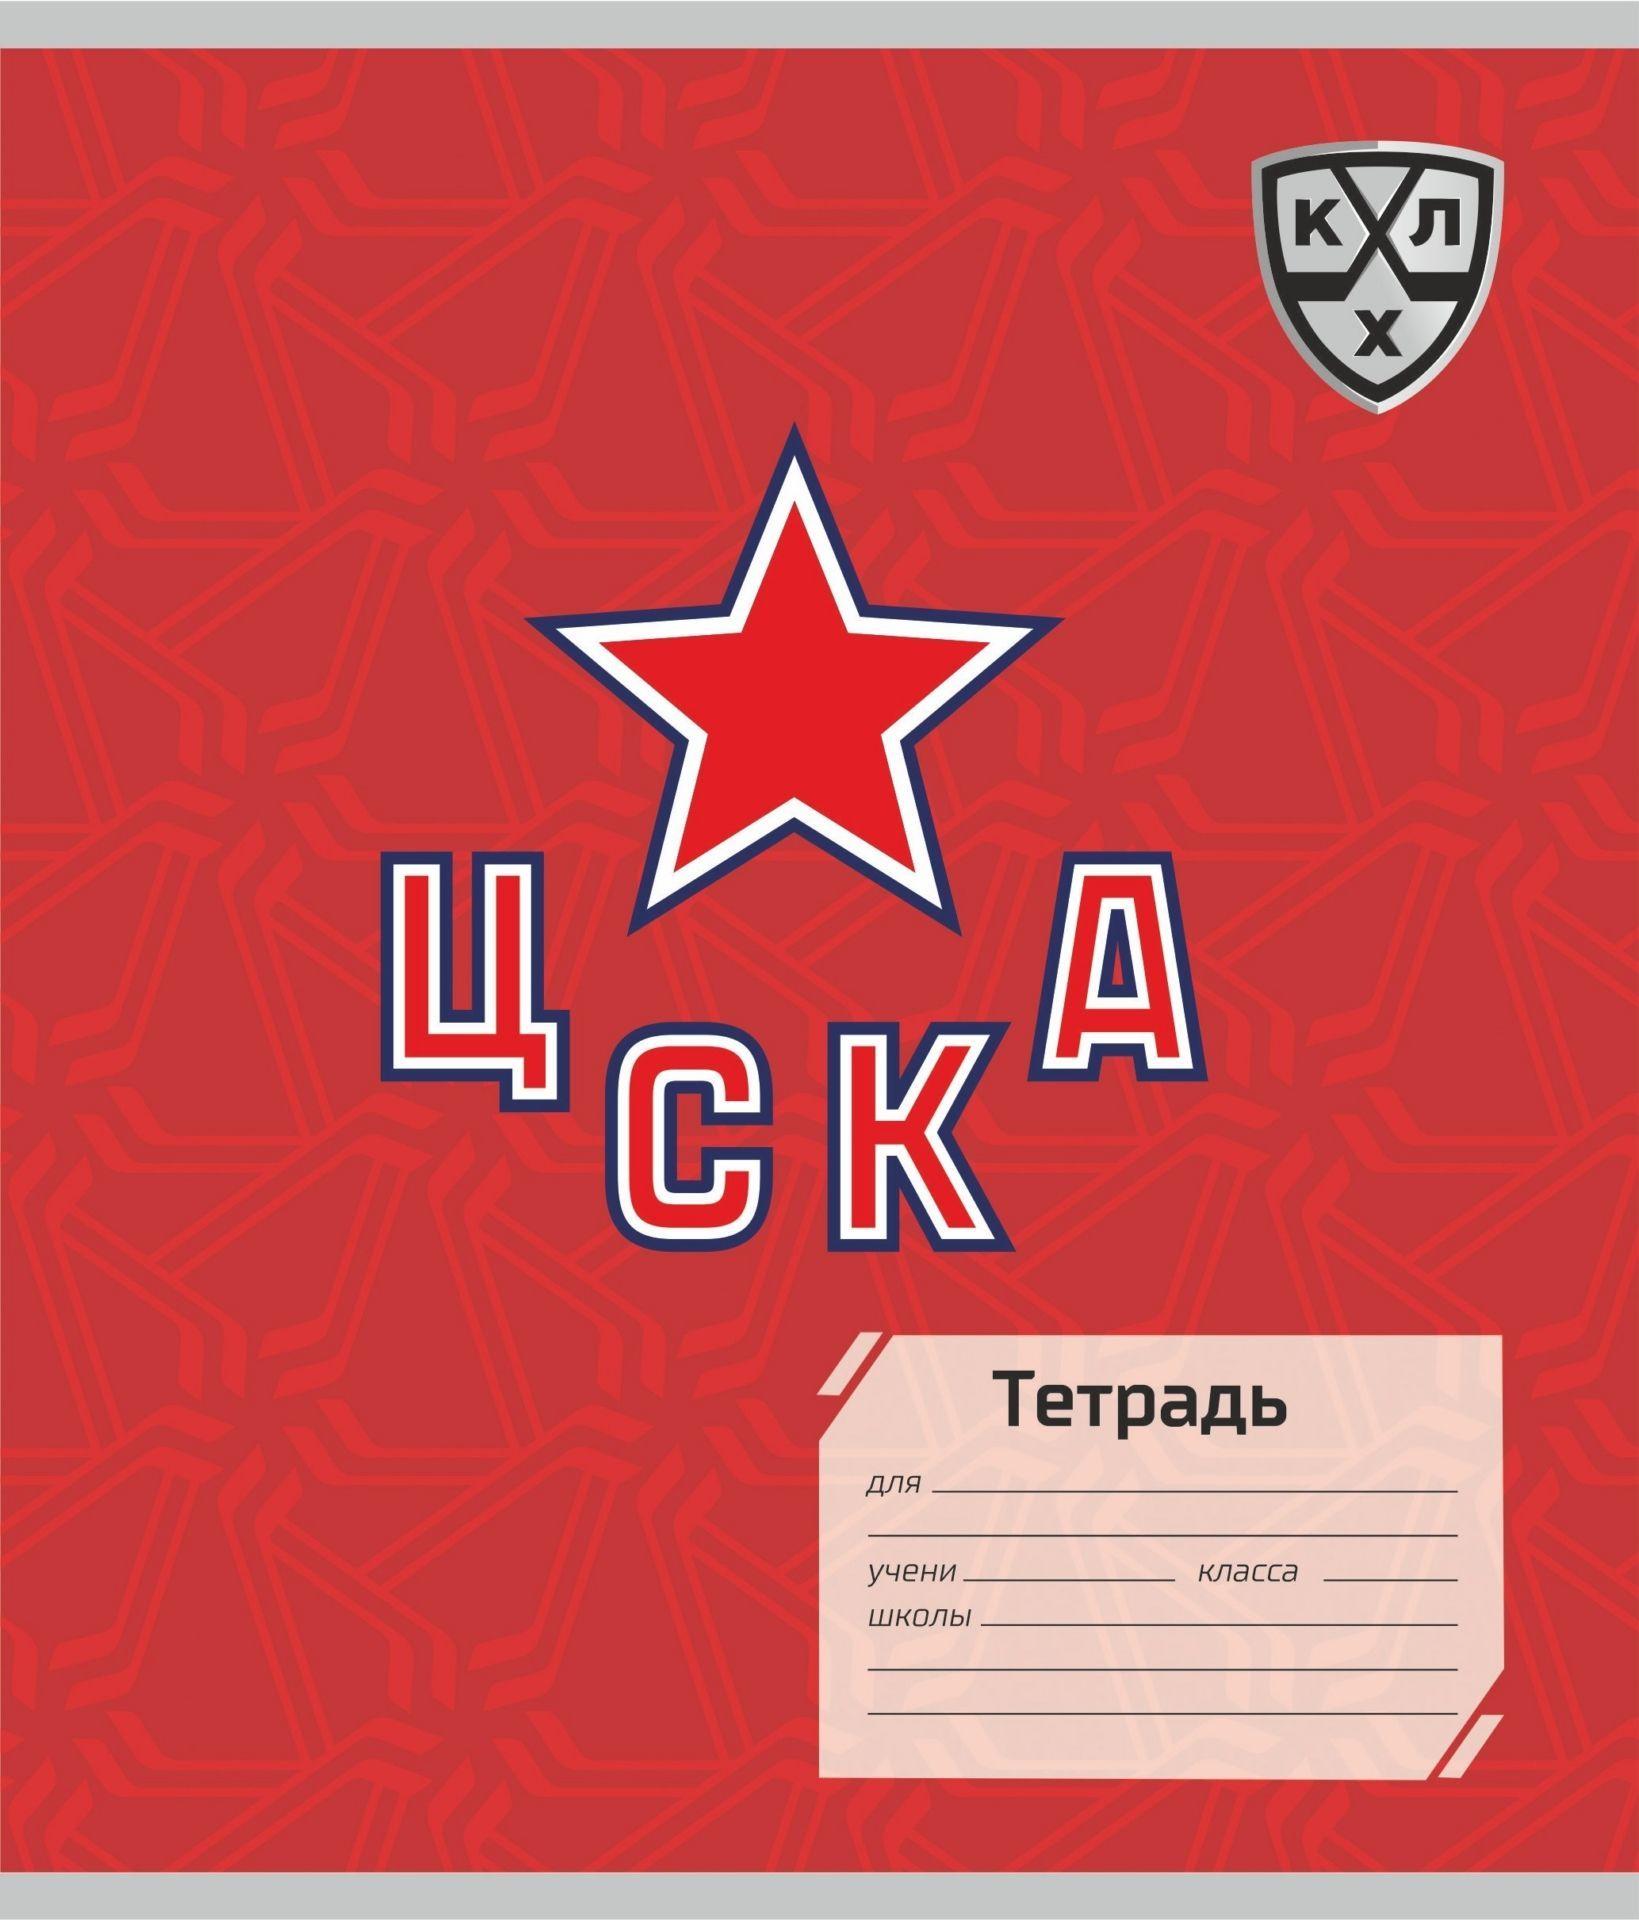 "Тетрадь 12 л. клетка (КХЛ: ХК ""ЦСКА"")"